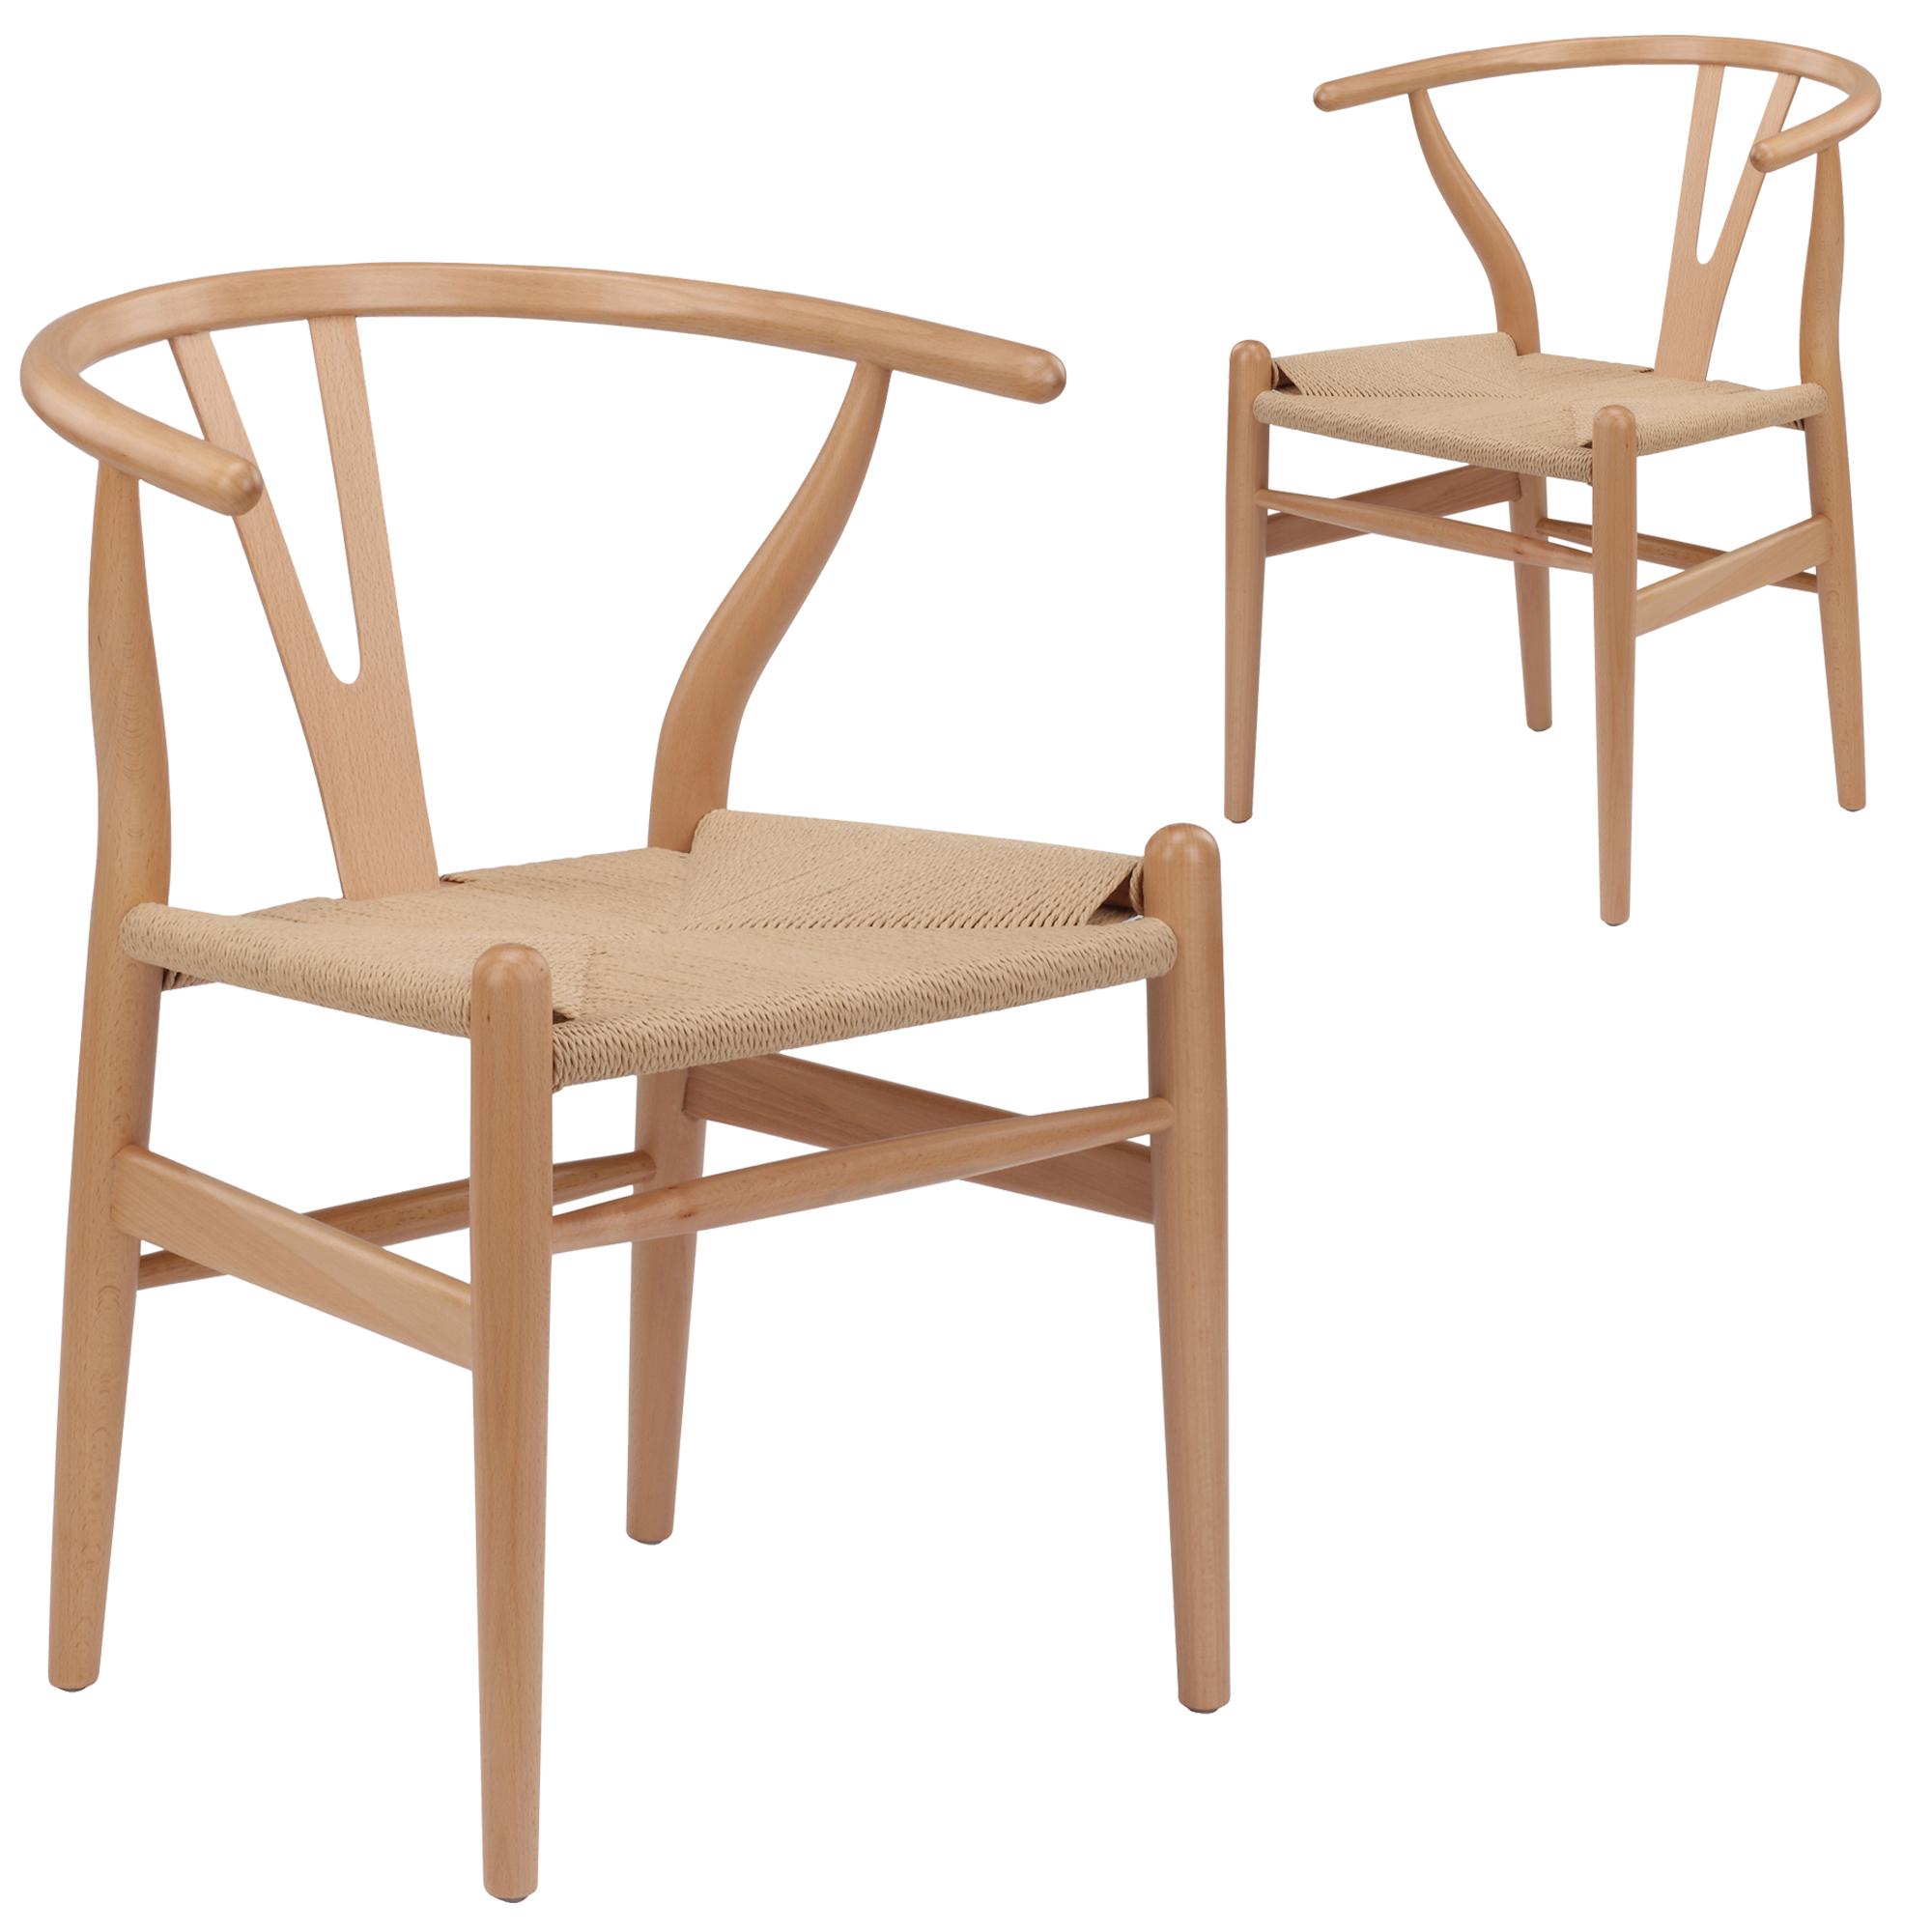 New Set Of 2 Natural Hans Wegner Replica Wishbone Chair Ebay